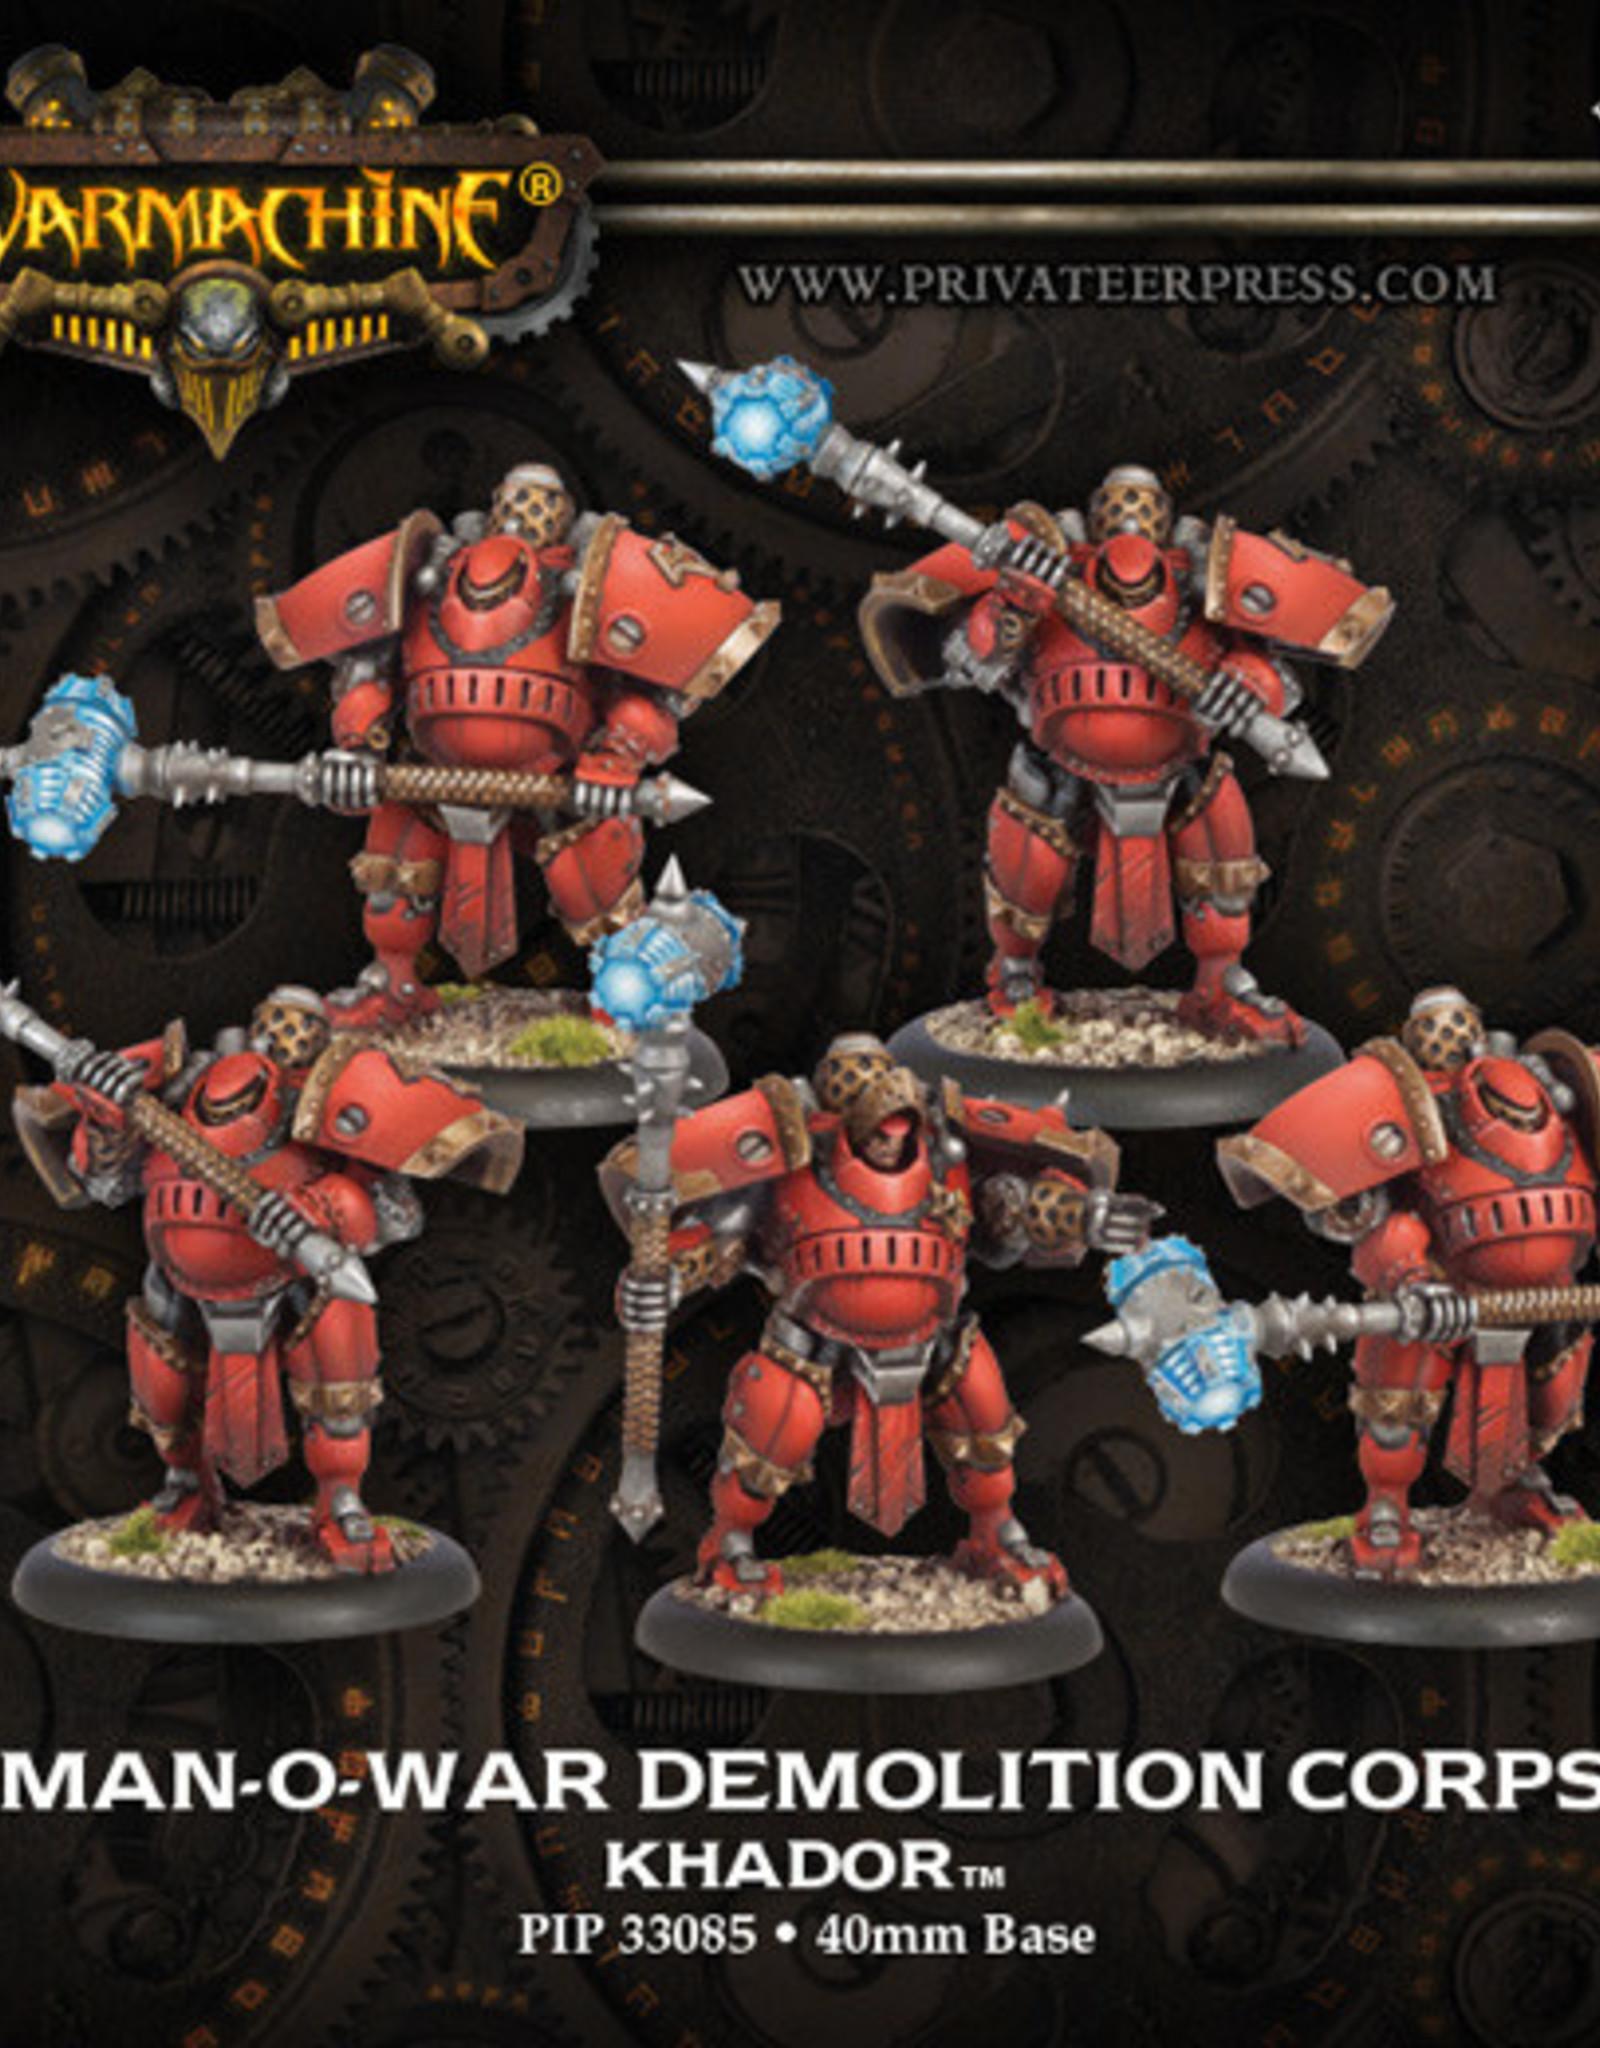 Warmachine Khador - Demolition Corps